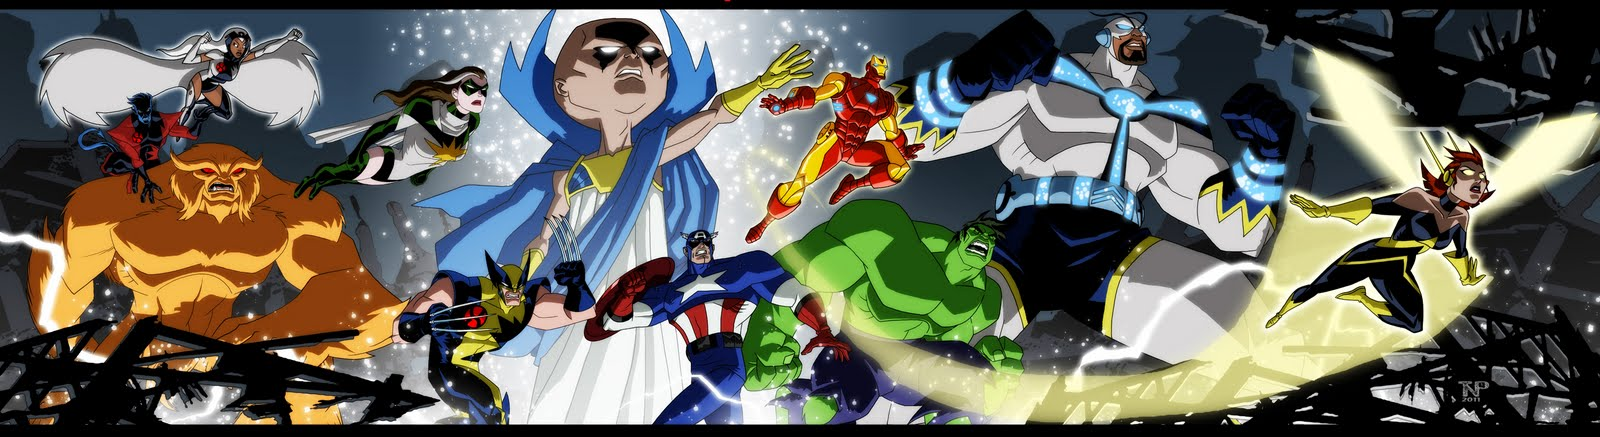 Avengers EMH crew gift poster